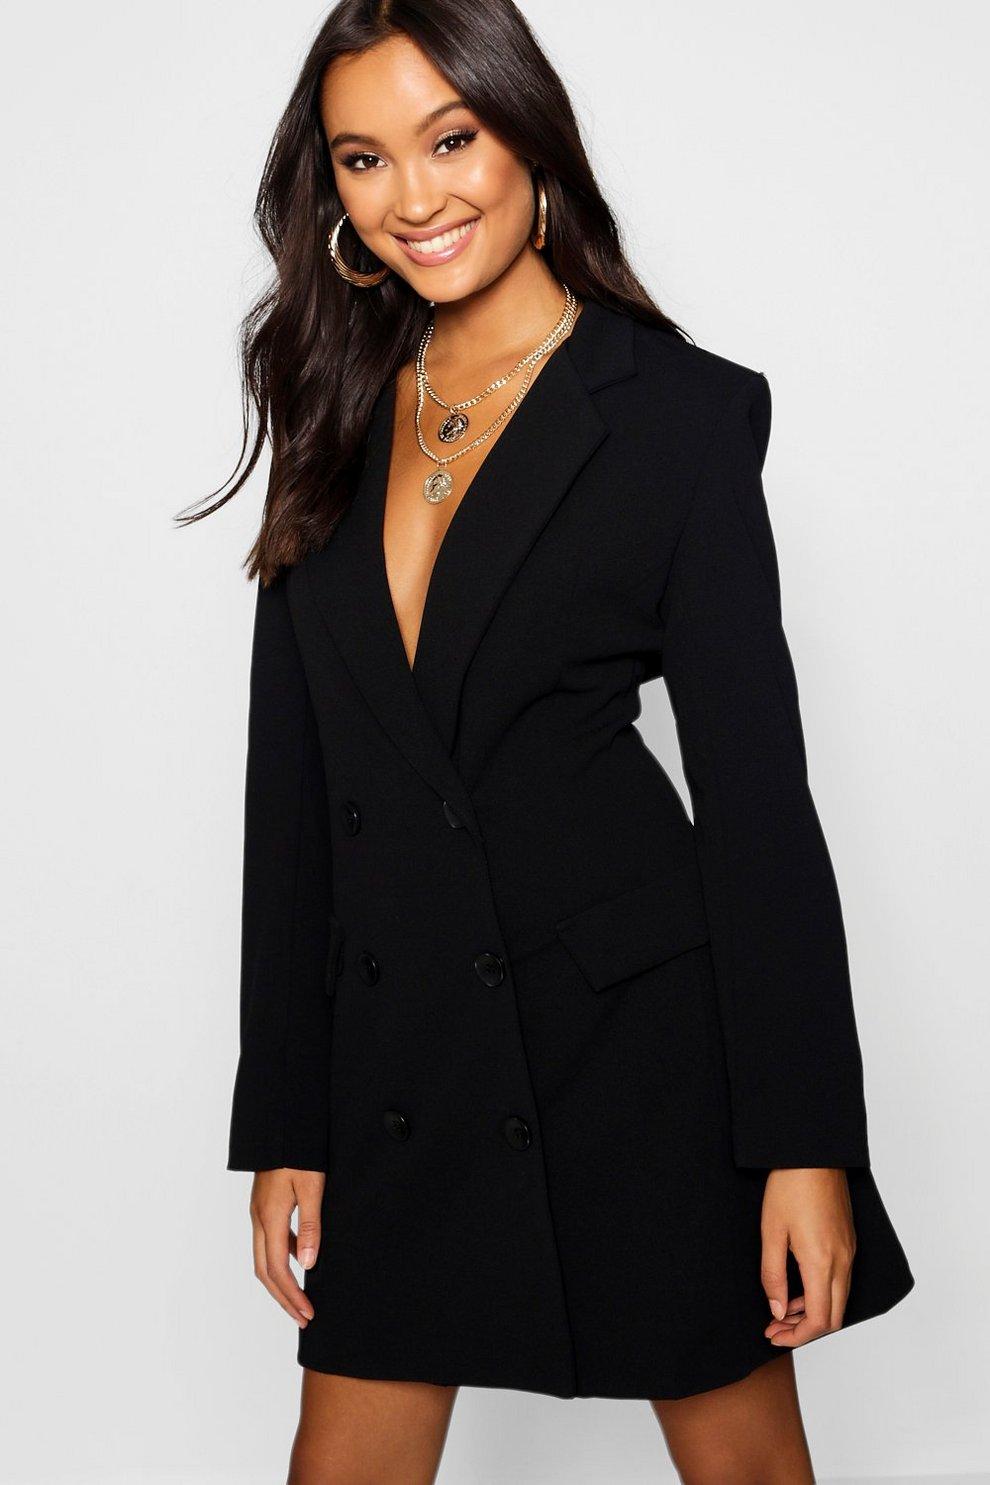 c4e1ea1dff29 Double Breasted Pocket Detail Blazer Dress | Boohoo